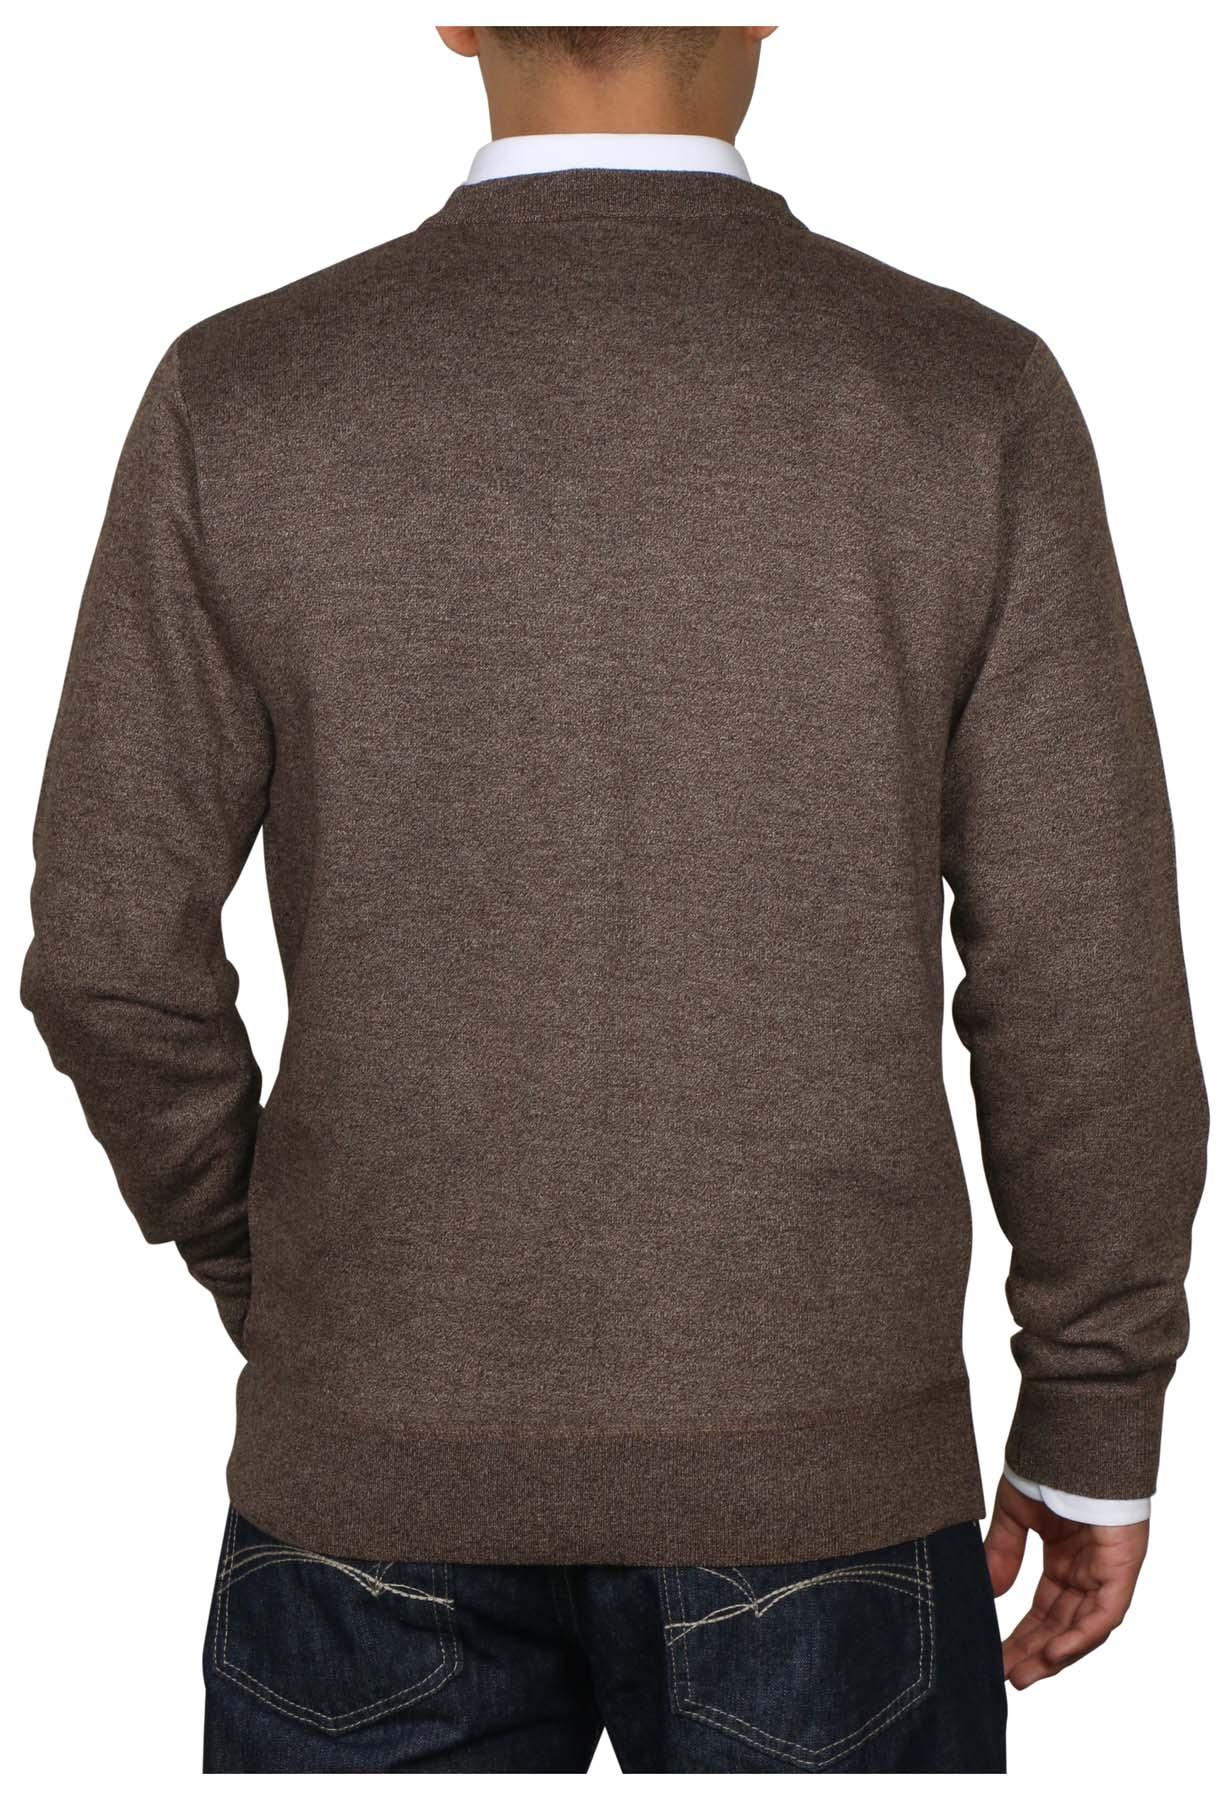 True Rock Men's Lightweight Long Sleeve V-Neck Sweater | eBay